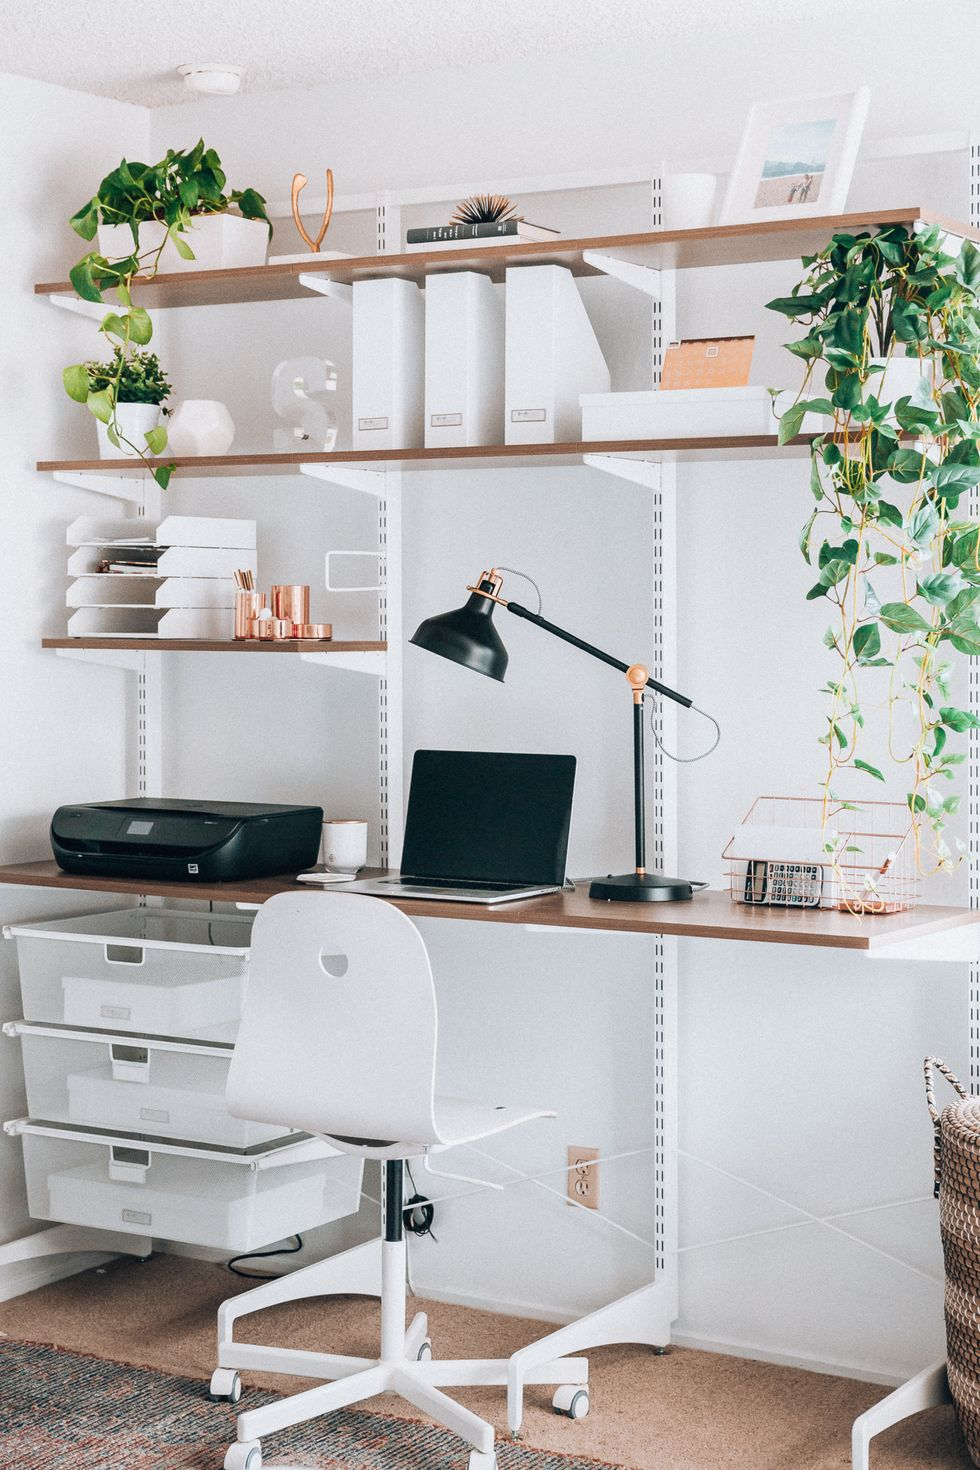 Diy-home-office-decor-organized-1582320656